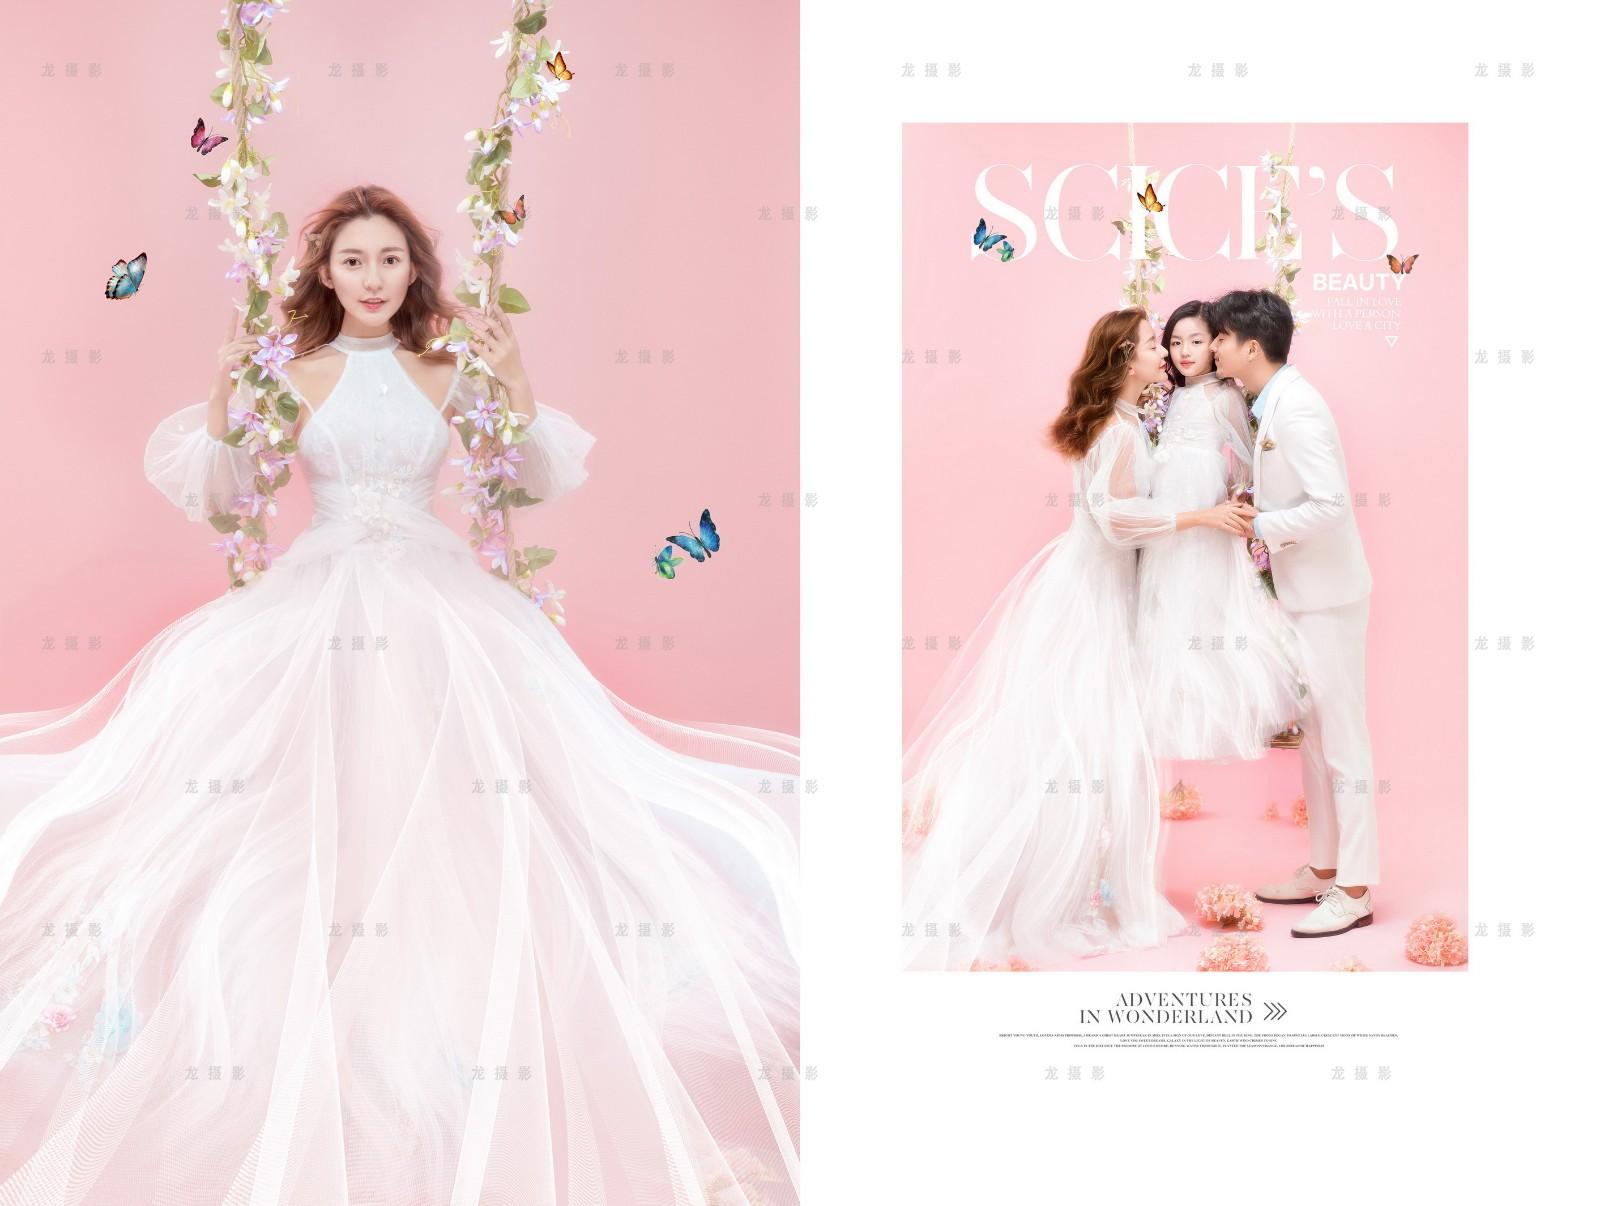 SUGAR|样片展示-朝阳尊爵龙摄影有限公司